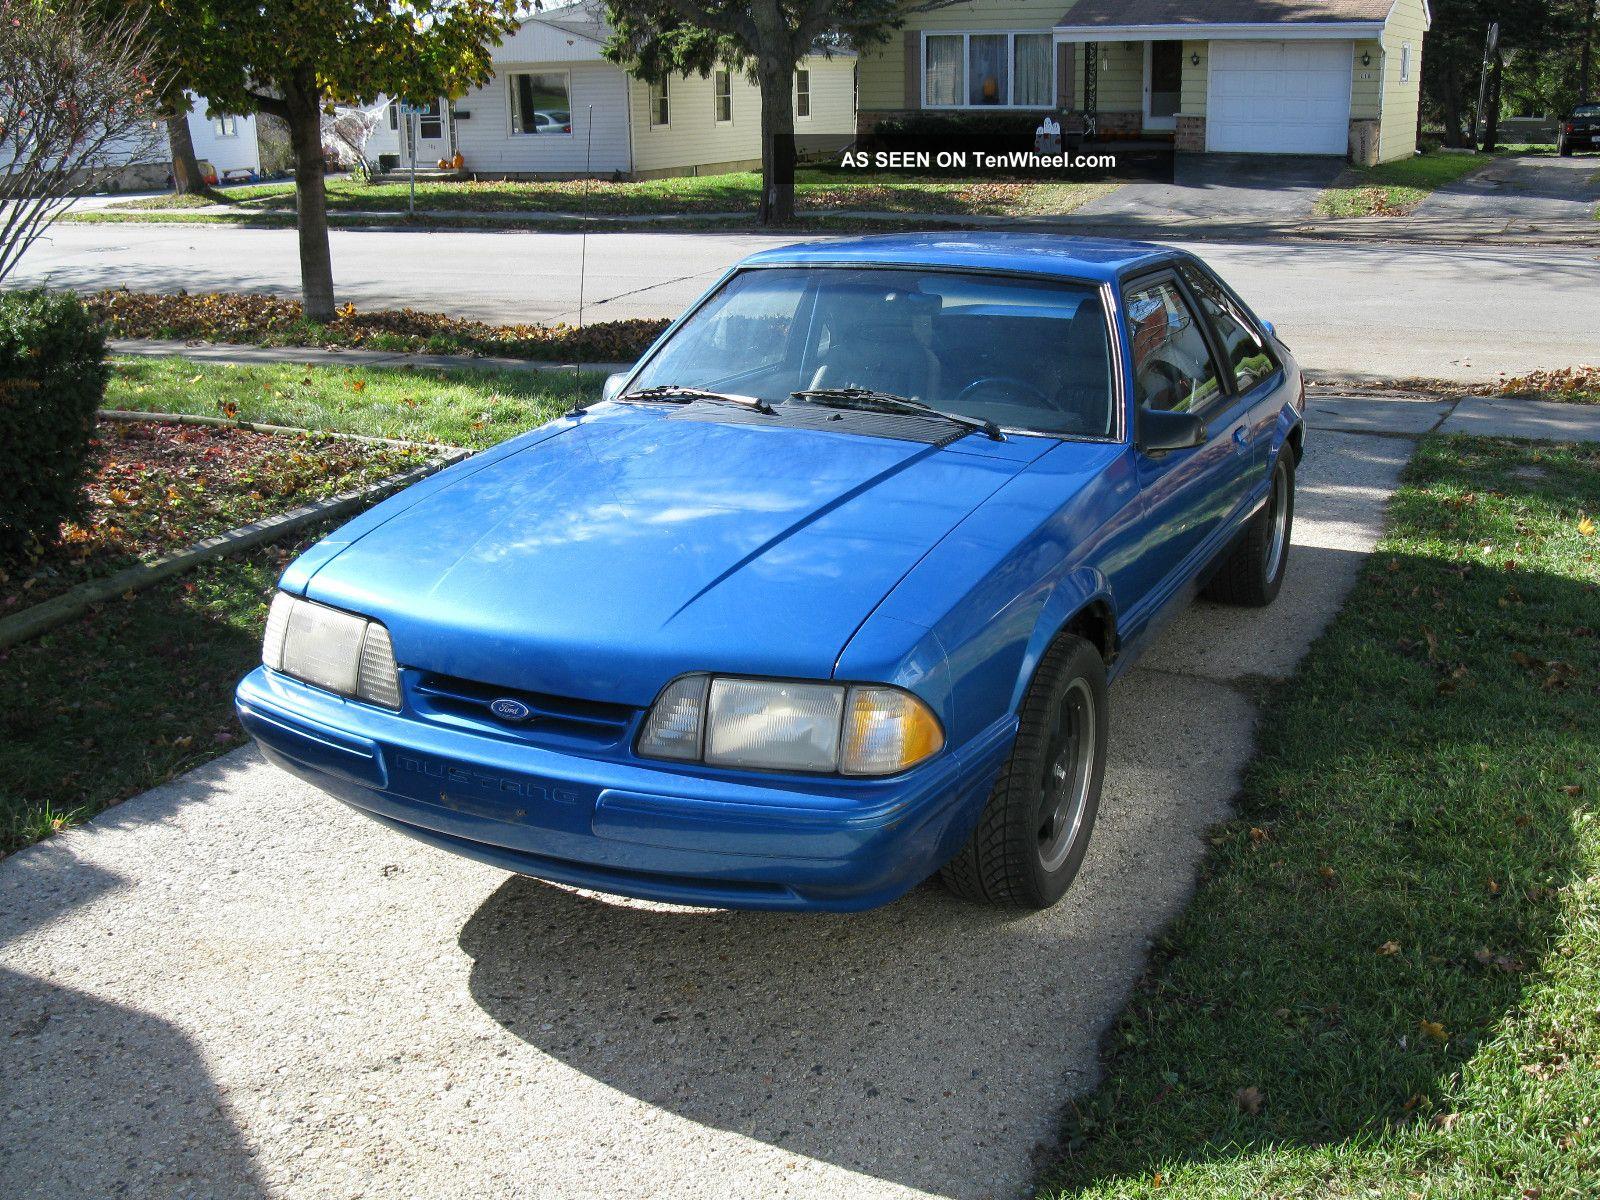 1989 Mustang Lx 5.0 Convertible Specs